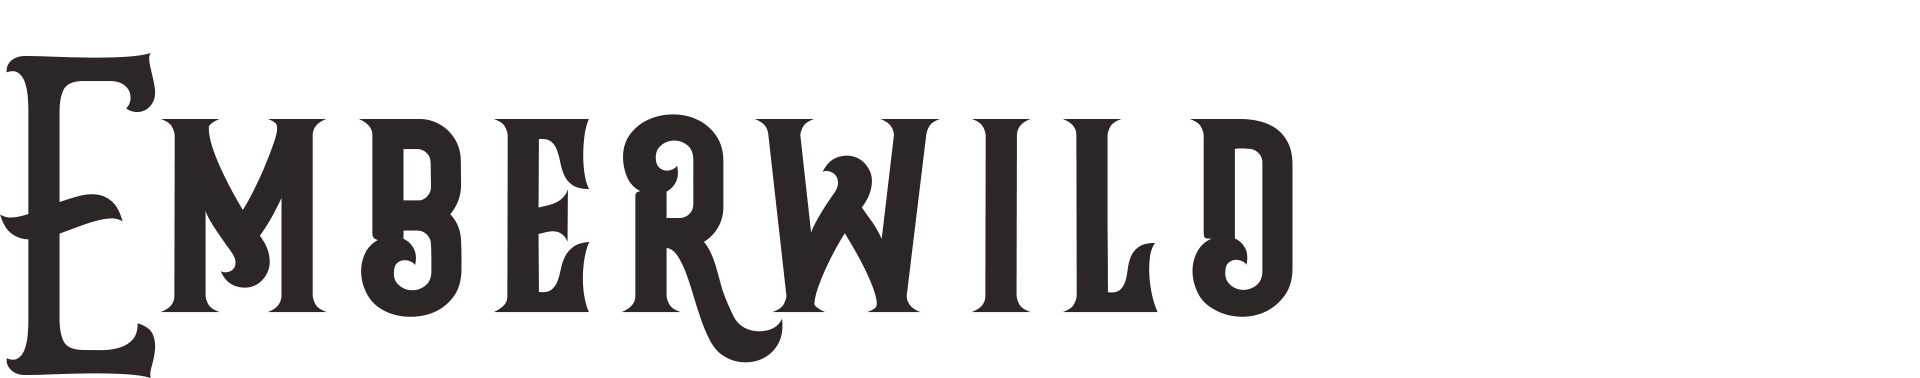 Emberwild